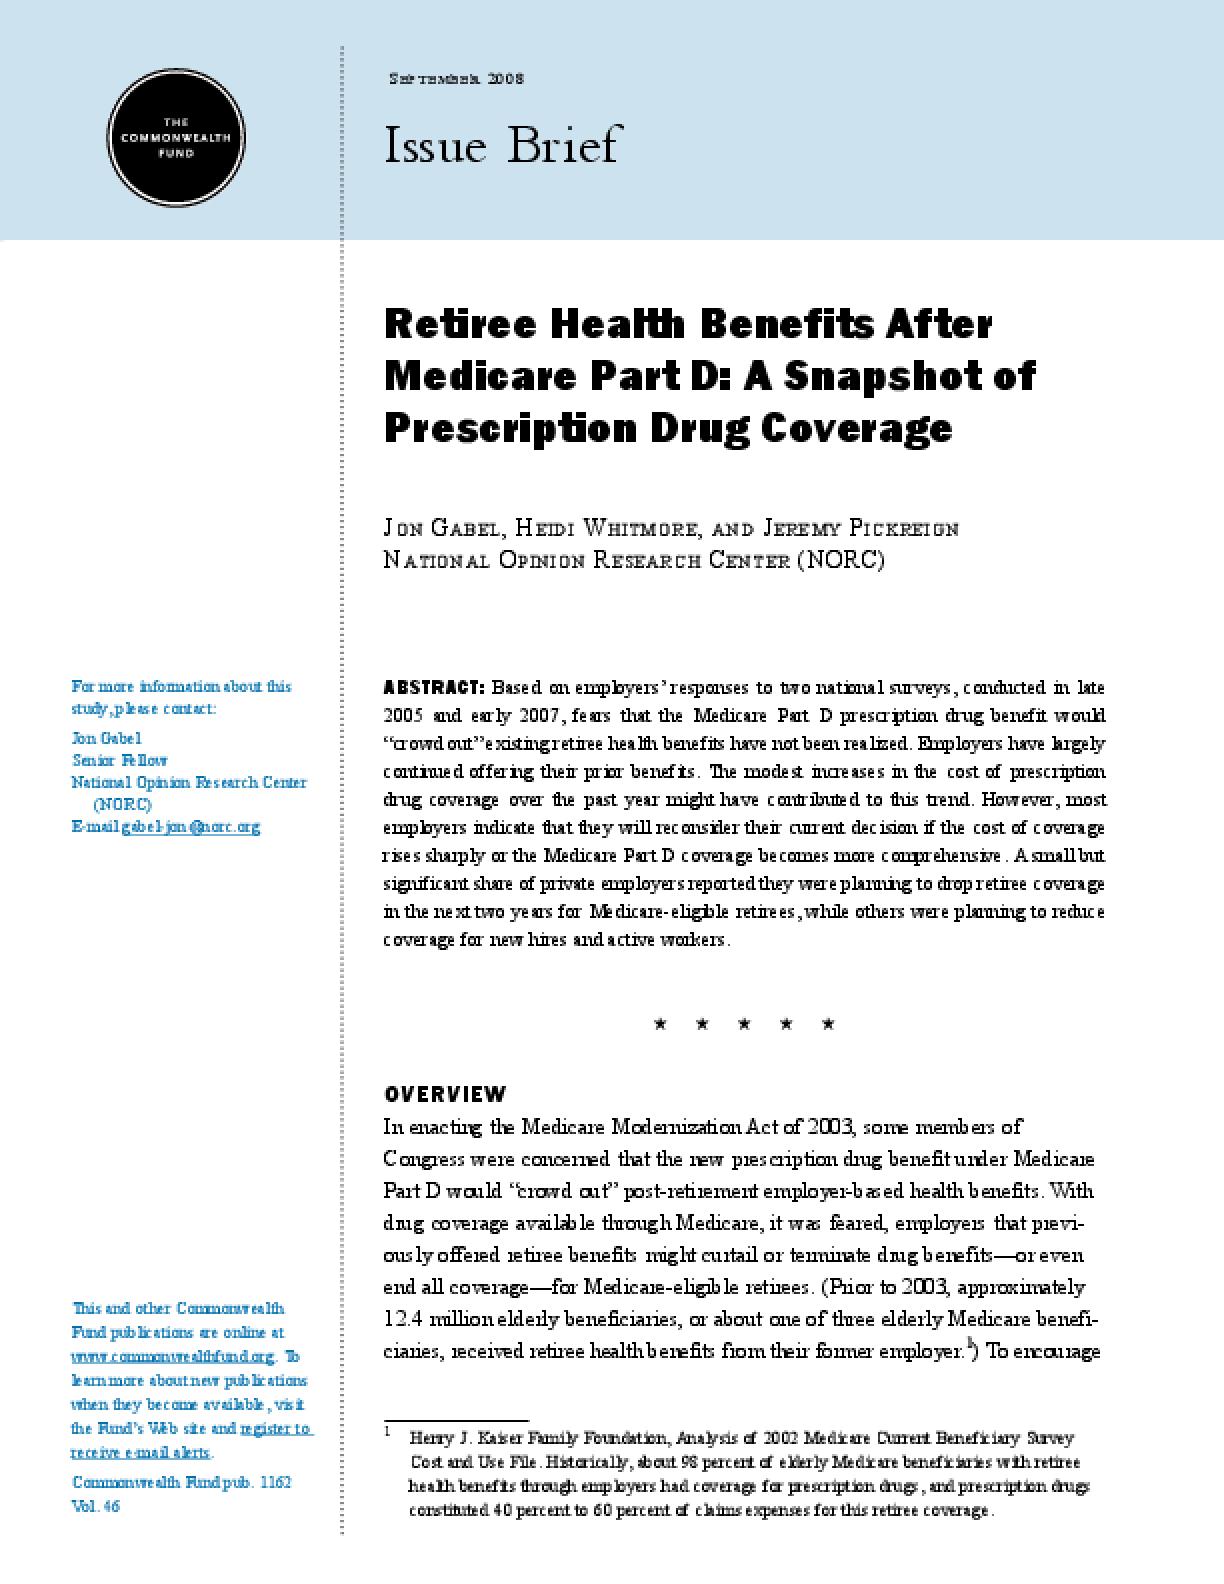 Retiree Health Benefits After Medicare Part D: A Snapshot of Prescription Drug Coverage